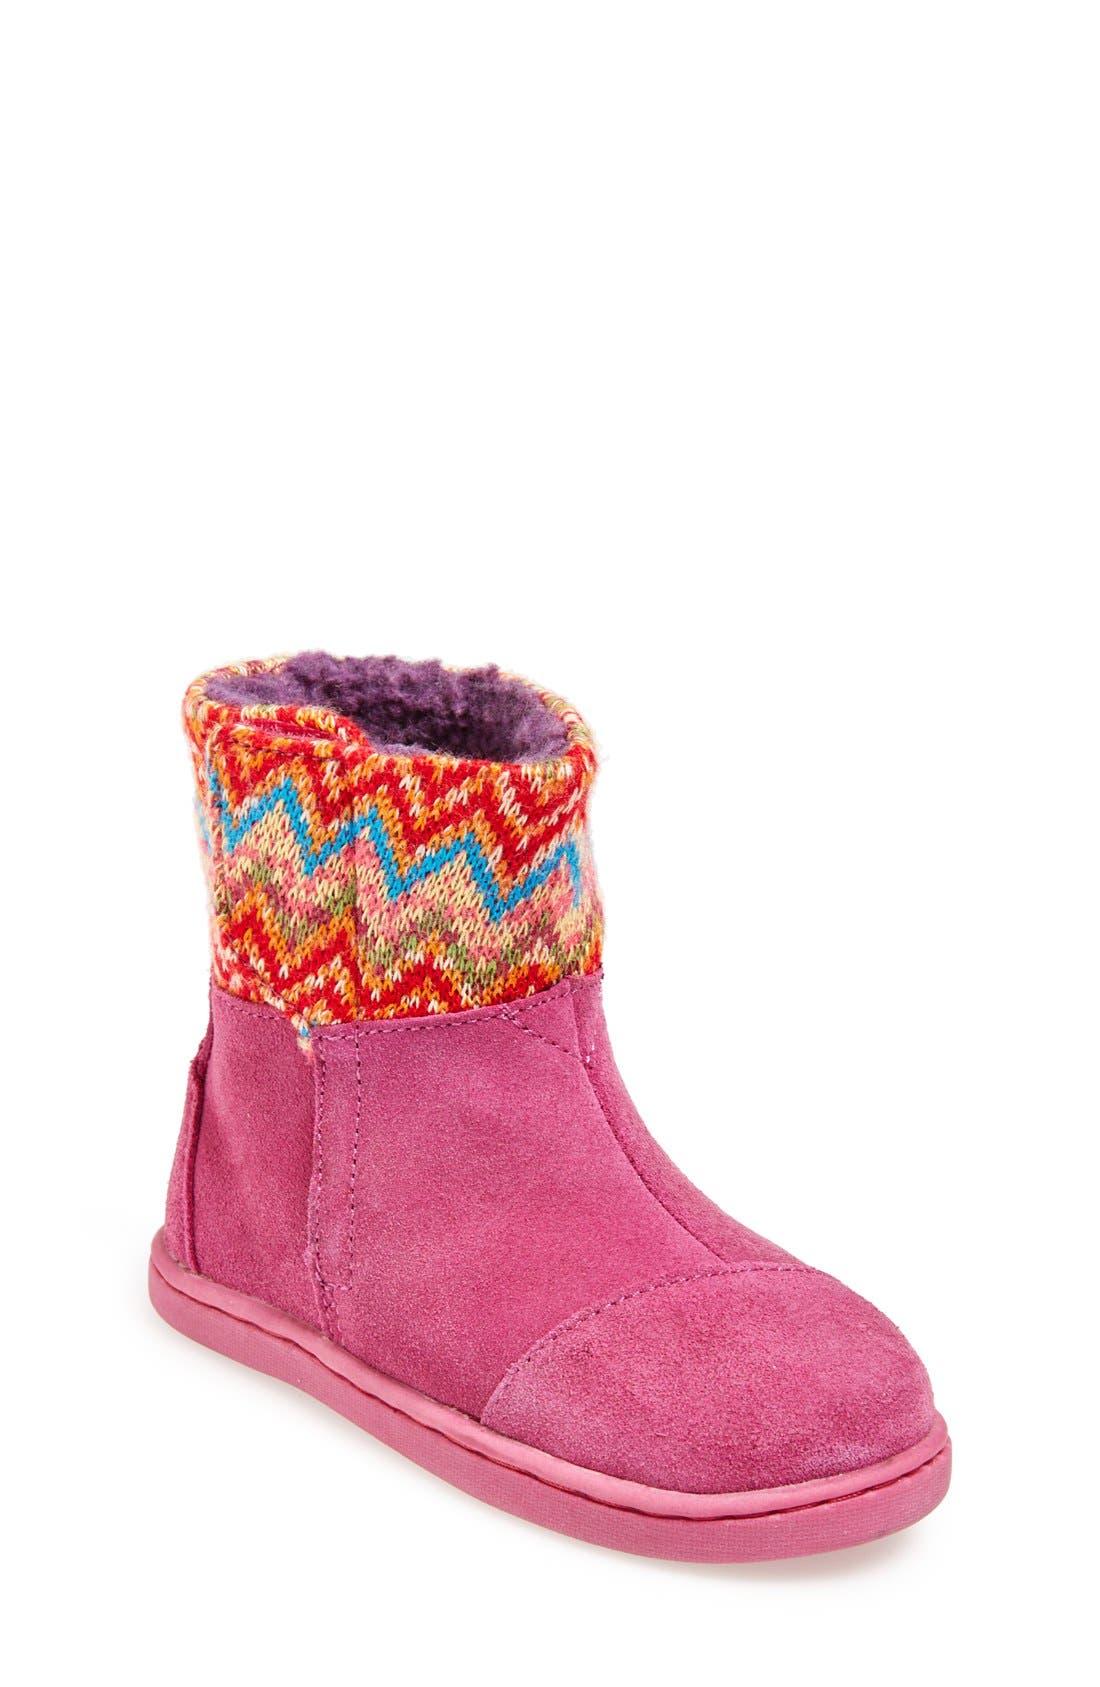 'Nepal - Tiny' Boot,                             Main thumbnail 1, color,                             Pink Multi Zigzag